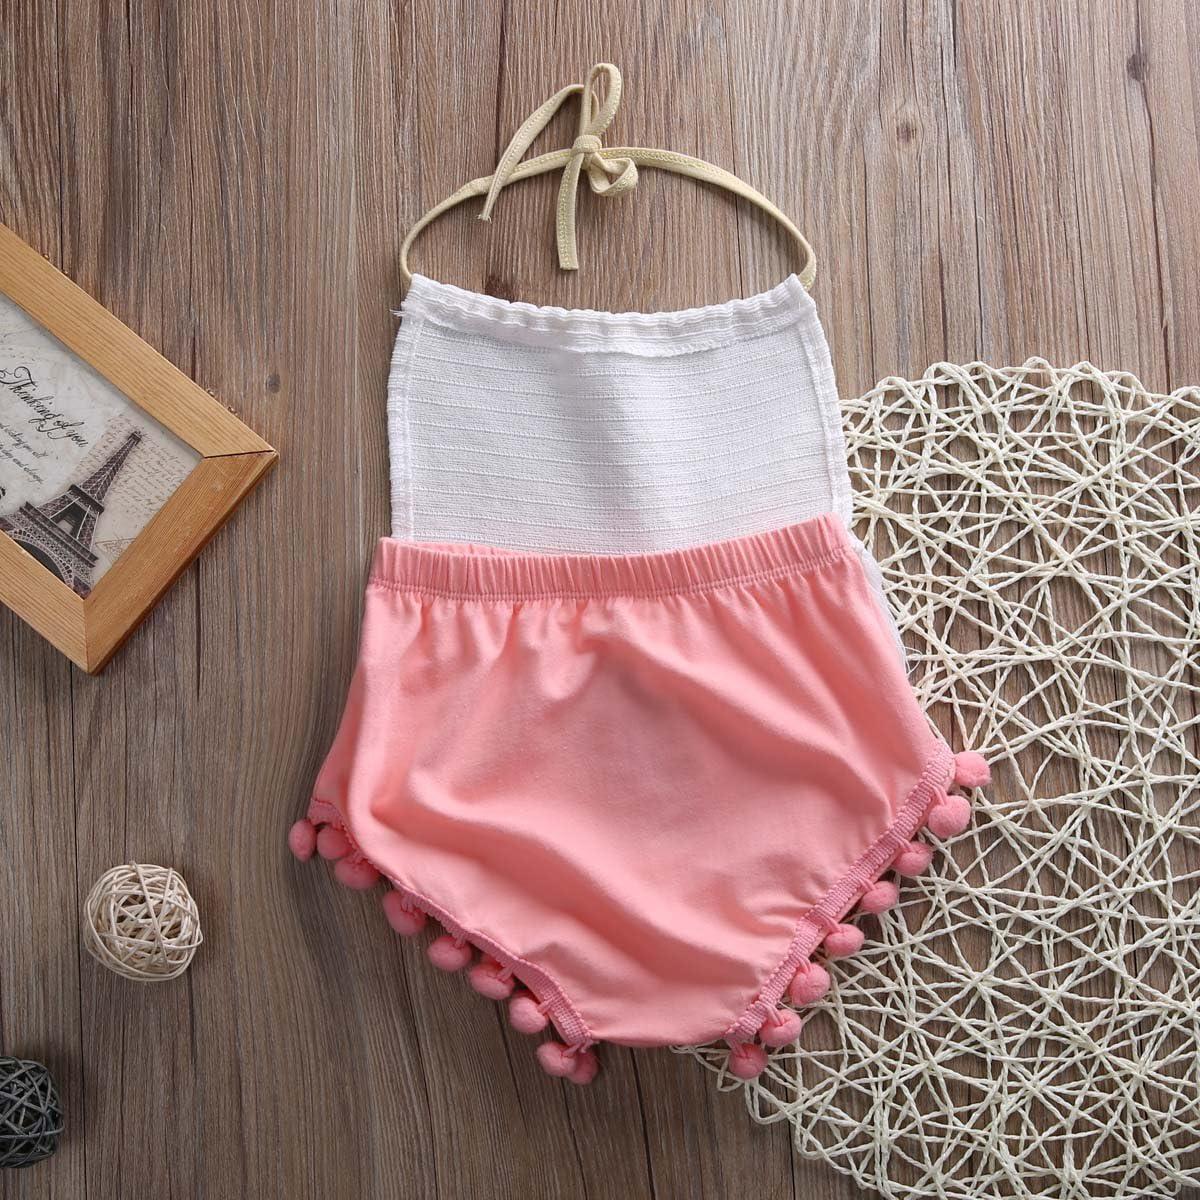 Toddler Baby Girl Clothes Halter Top Backless Sunflower Lace Tassel Polka Dot Short Pants Summer Outfits Set